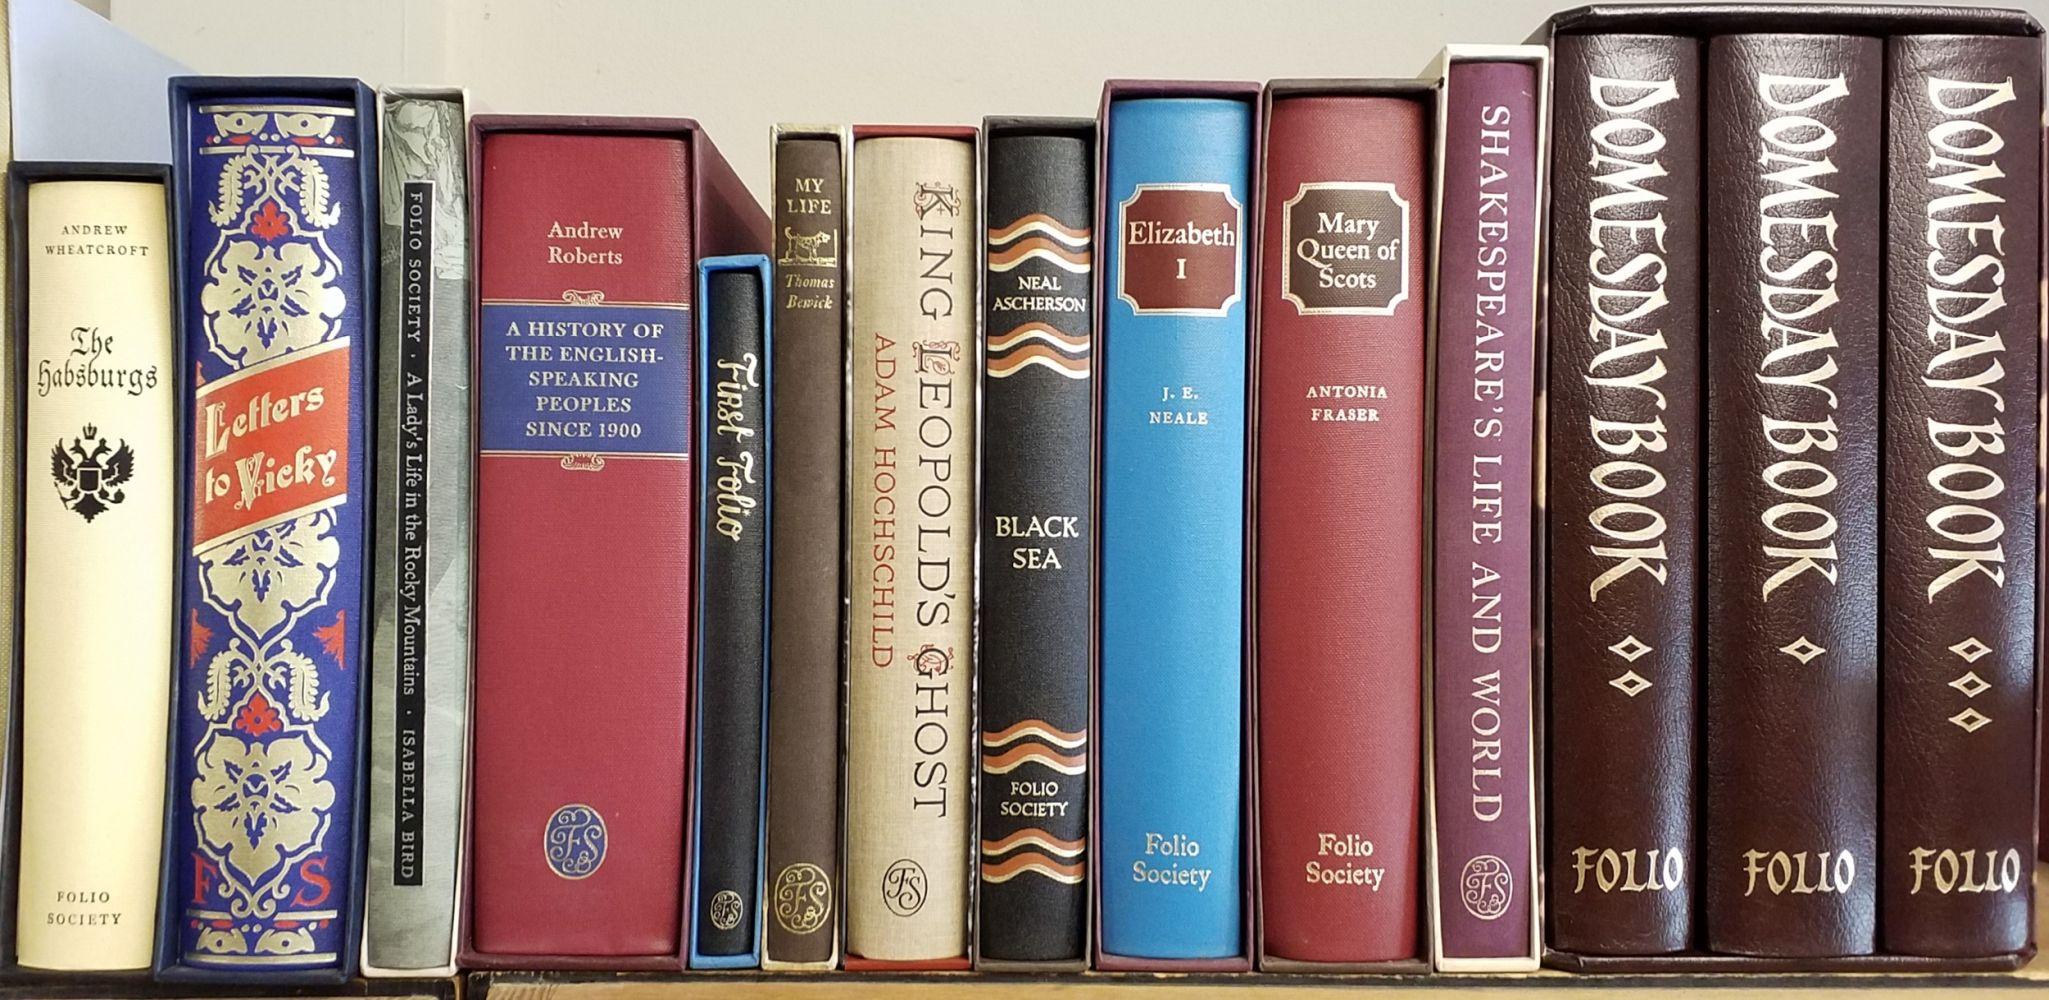 Folio Society. 55 volumes - Image 4 of 4